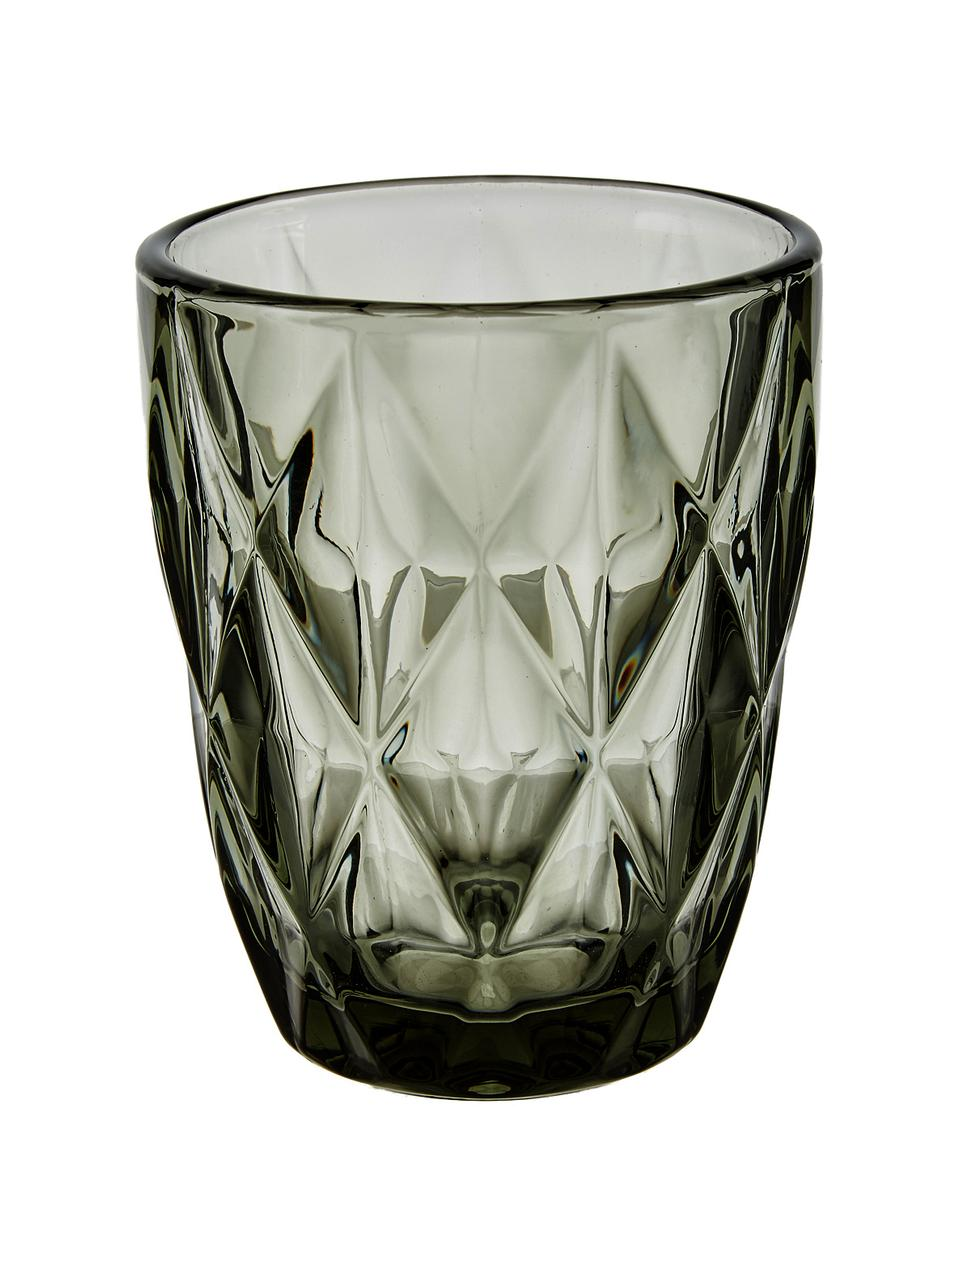 Set 4 bicchieri acqua con motivo a rilievo Colorado, Vetro, Verde, rosa, blu, grigio, Ø 8 x Alt. 10 cm